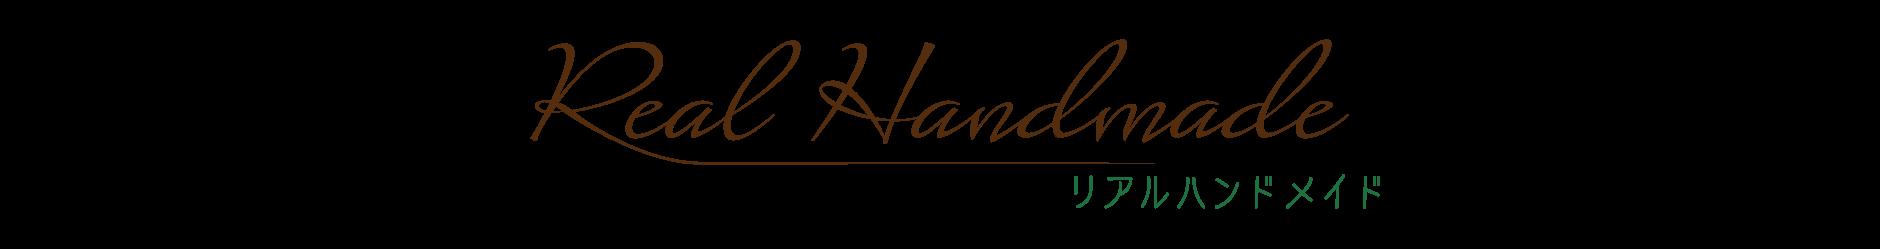 REAL HANDMADE-�ꥢ��ϥ�ɥᥤ��